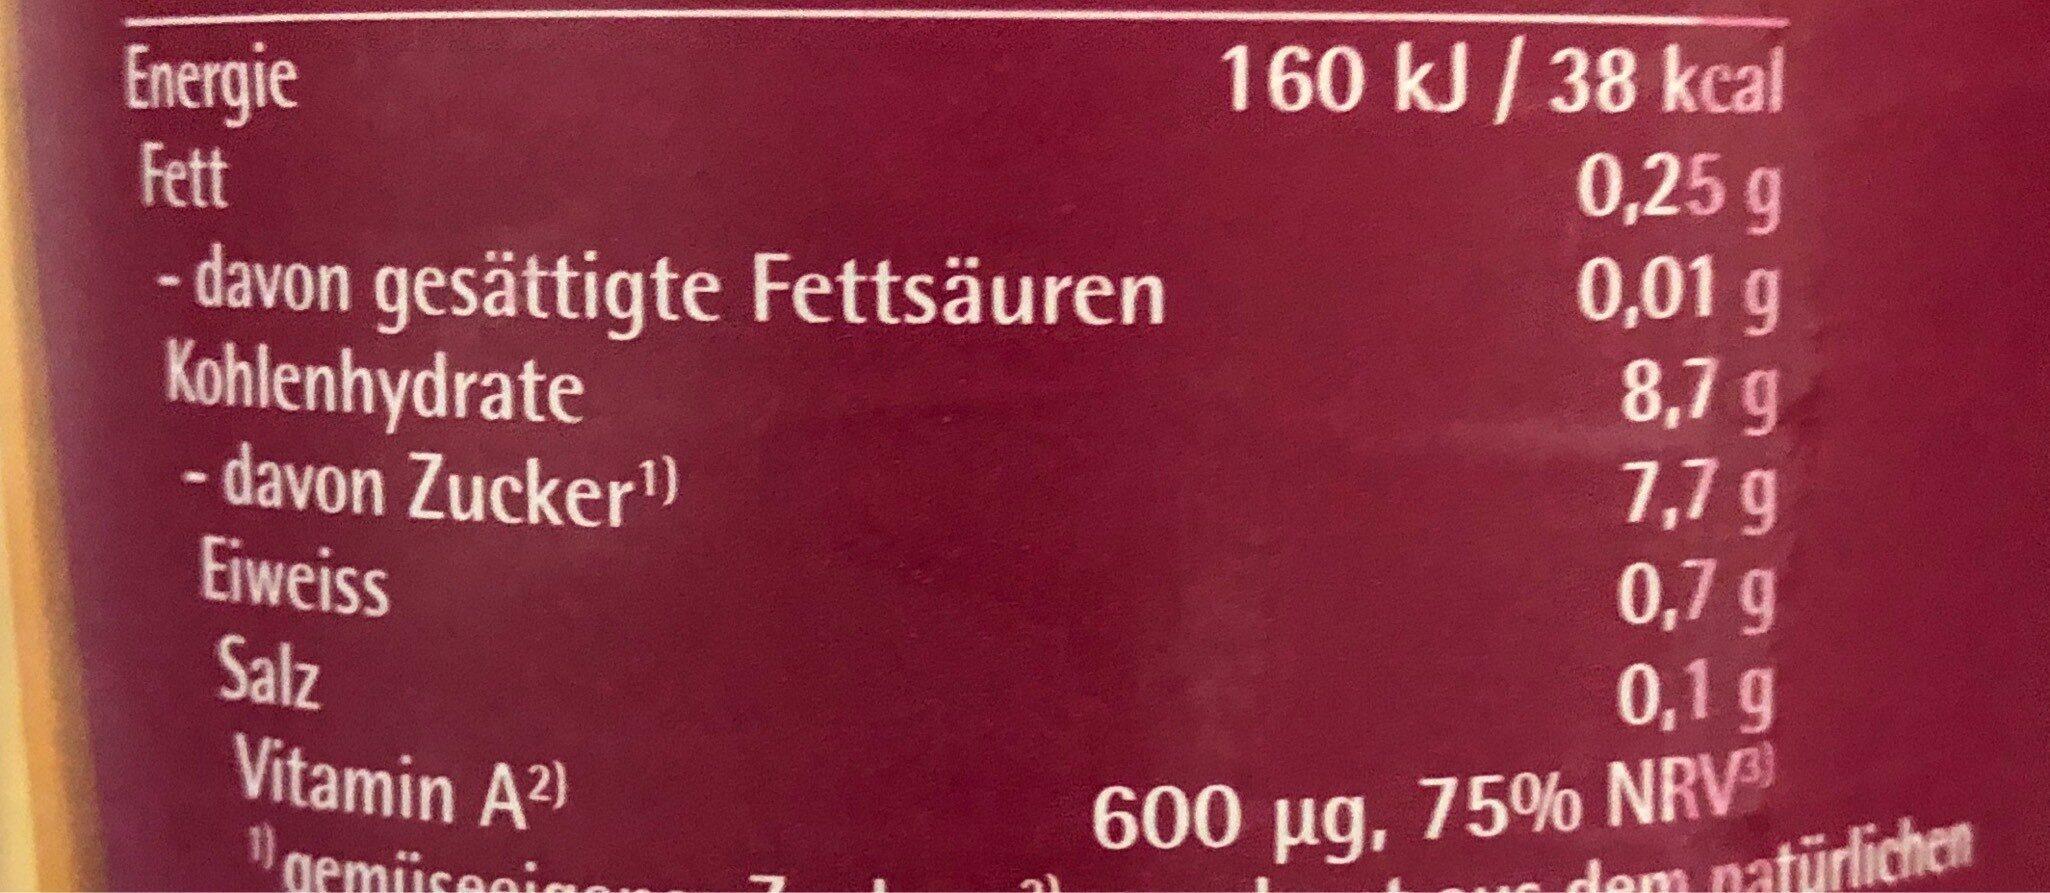 Beutelsbacher - Valori nutrizionali - fr